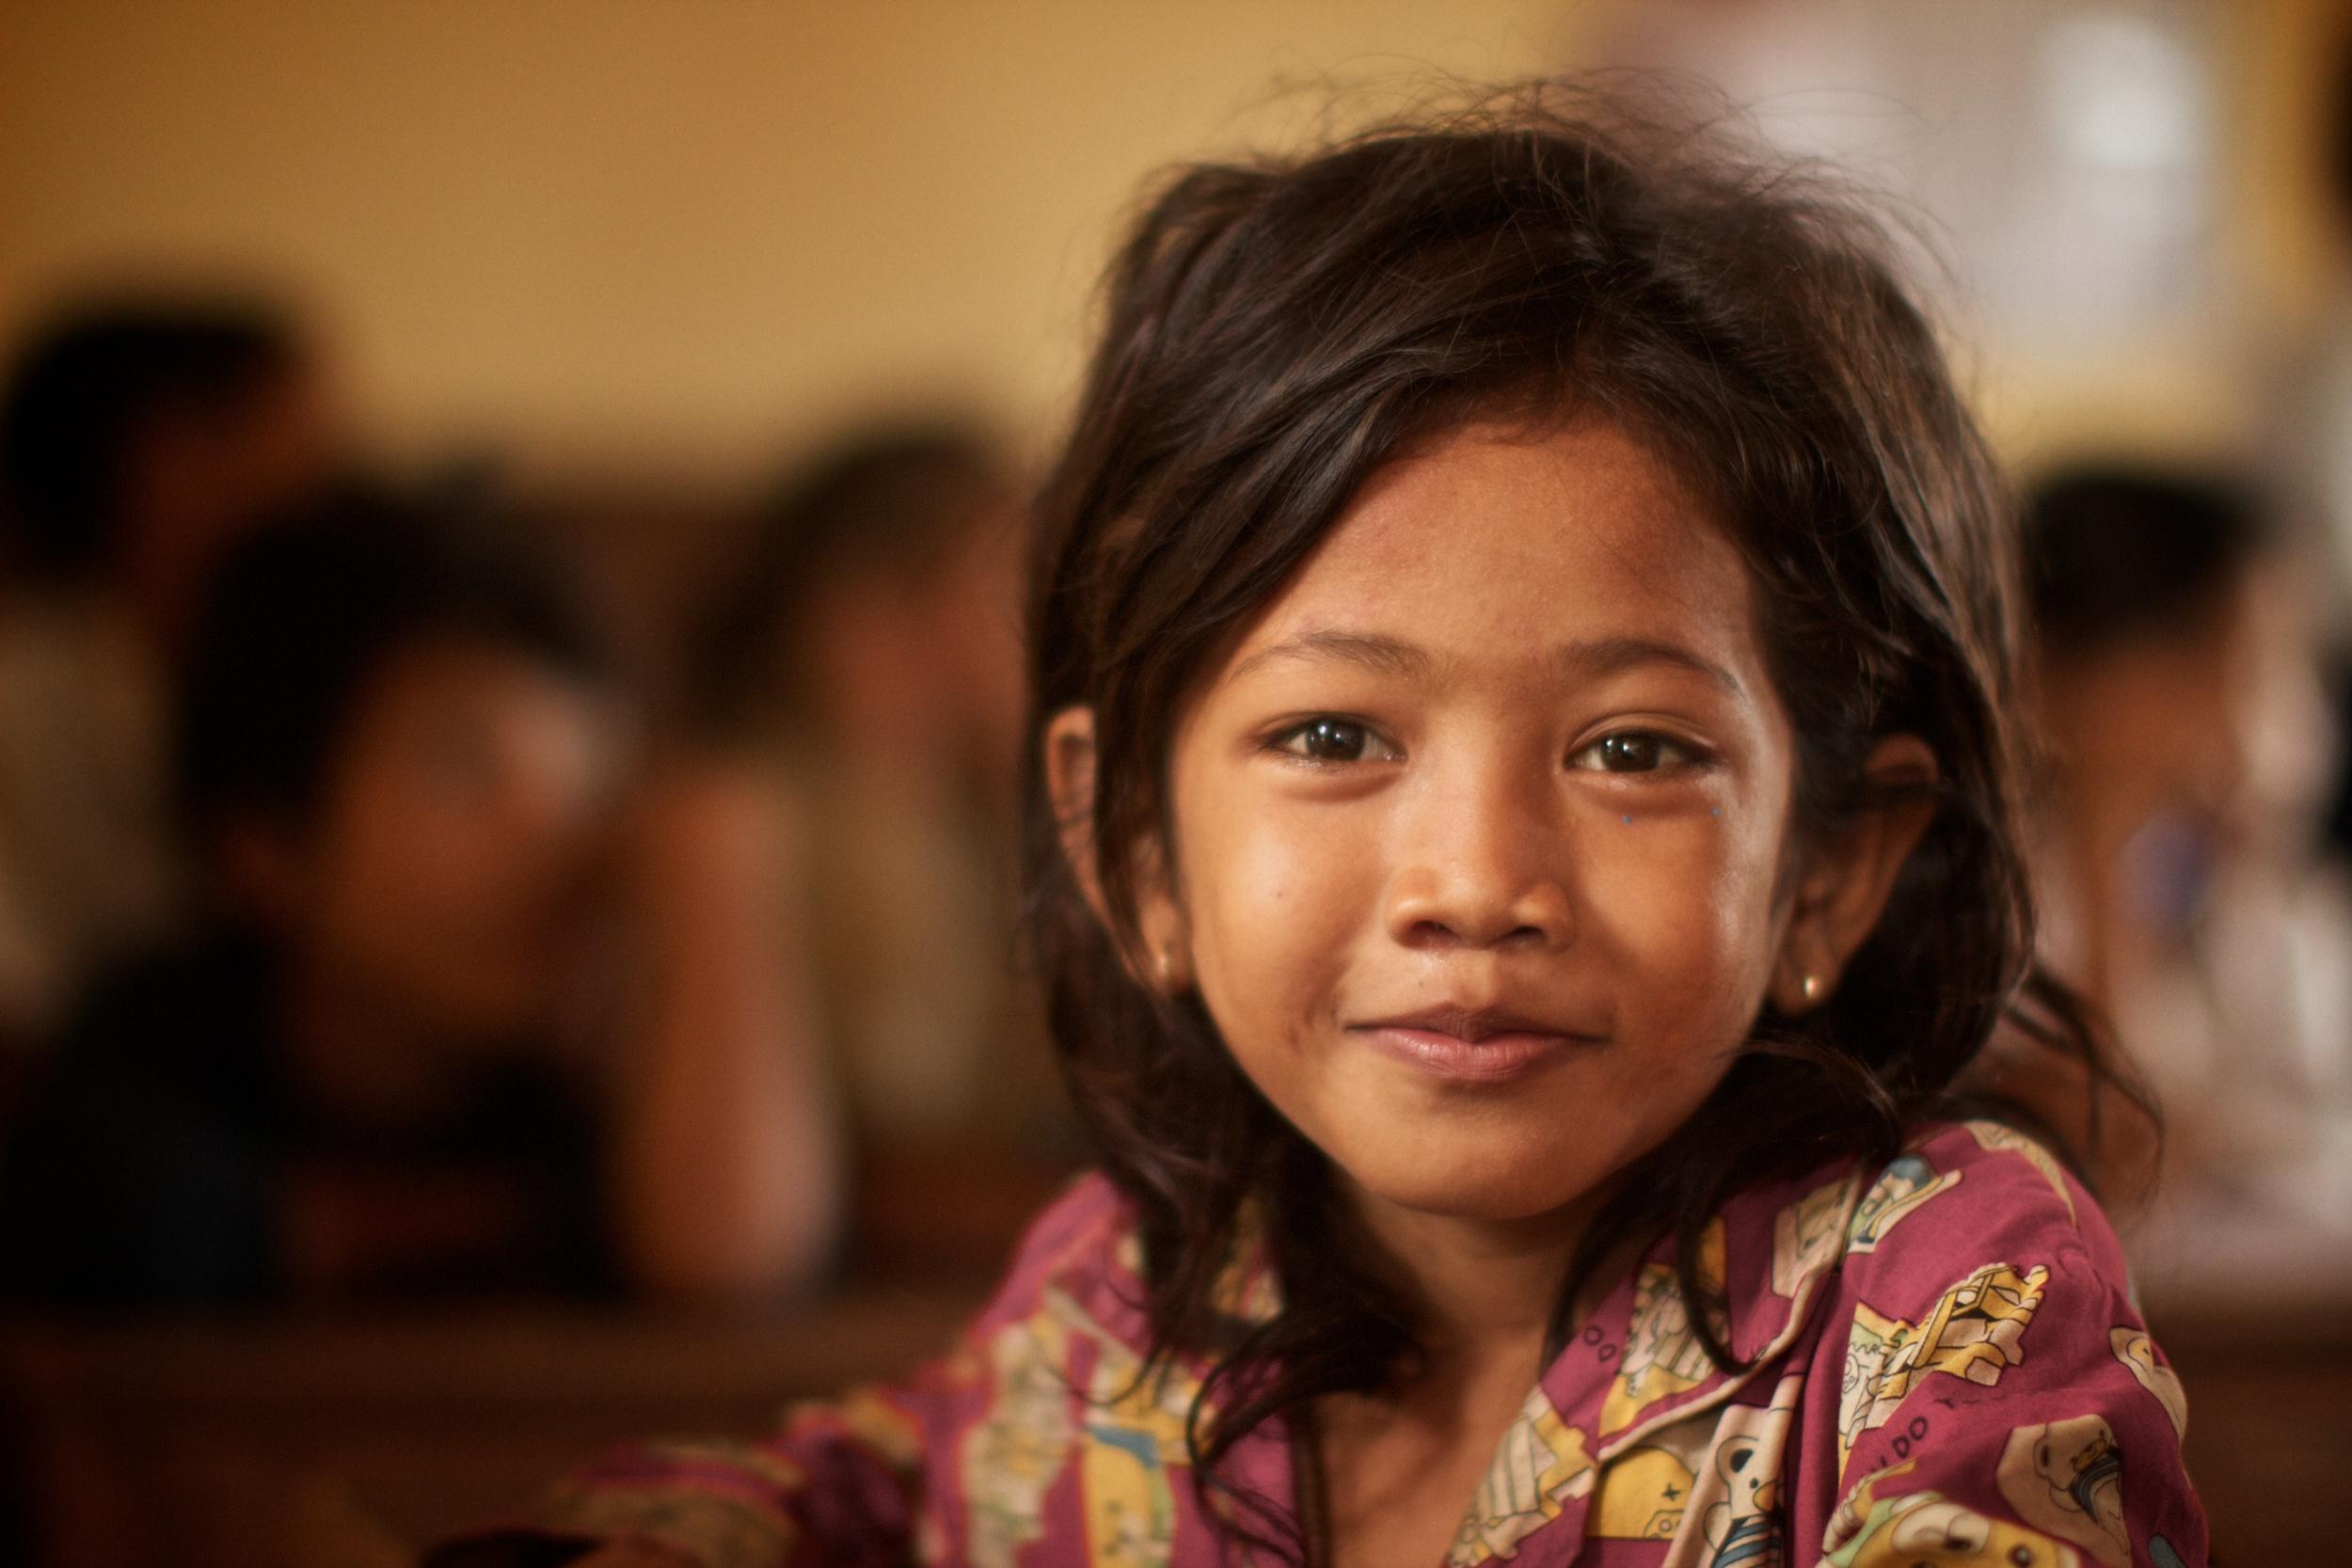 In a cambodian school IV.jpg